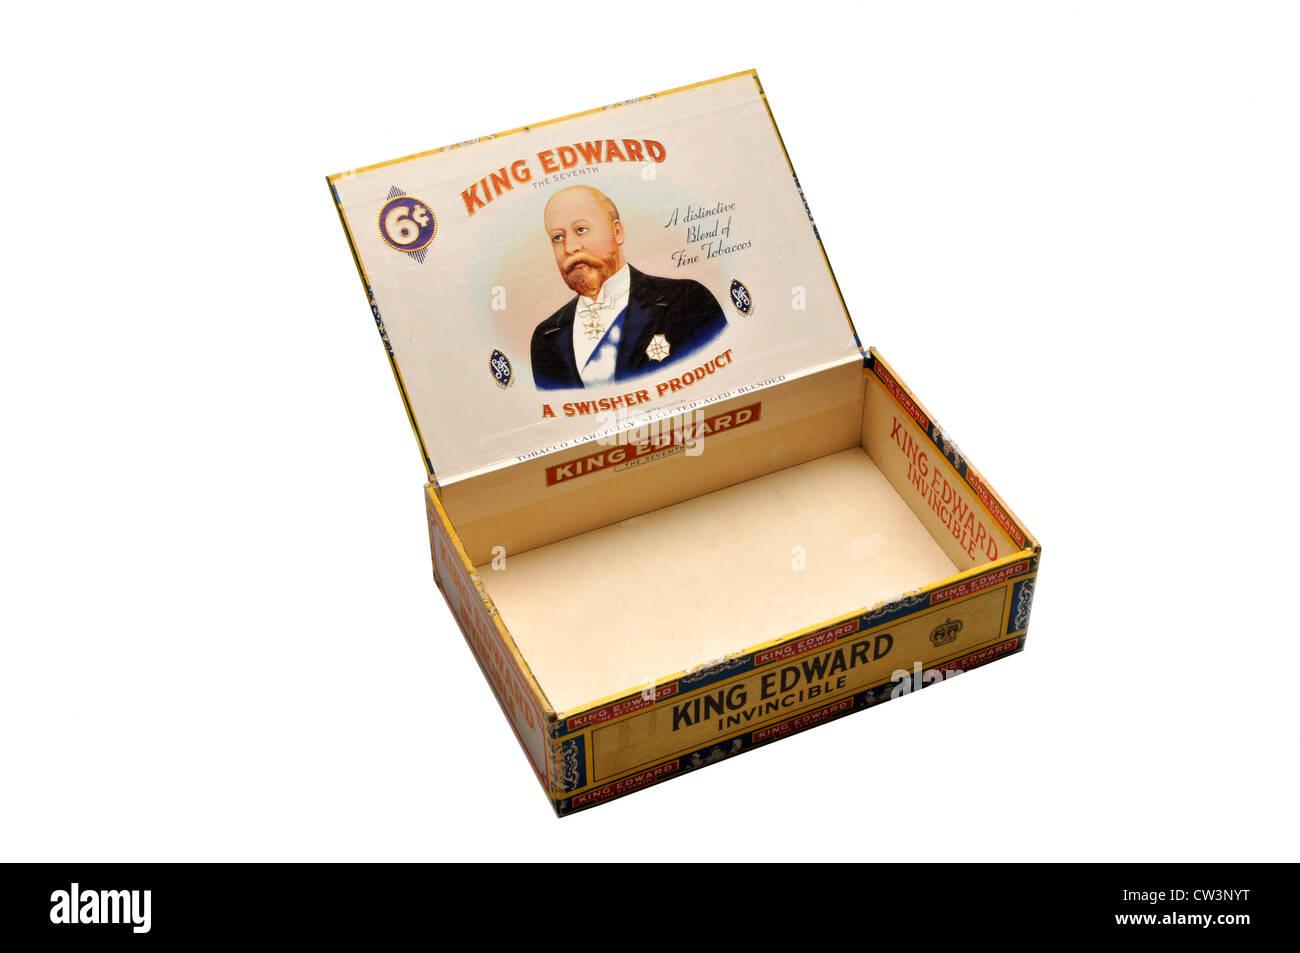 King Edward old cigar box open lid on white - Stock Image